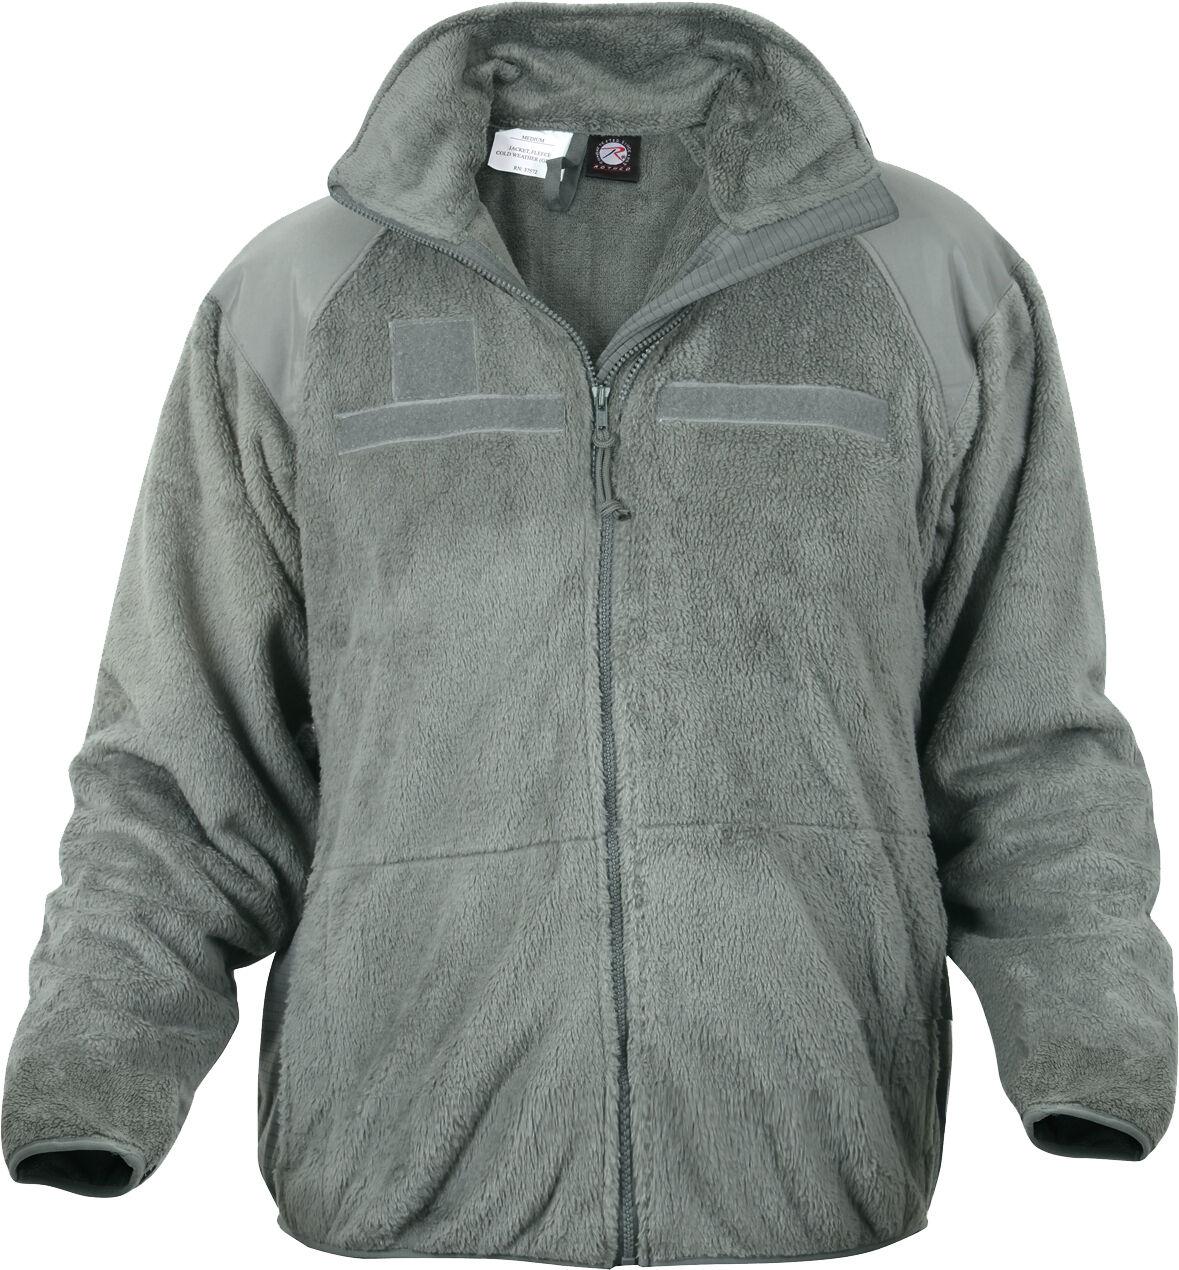 Foliage Green ECWCS Gen III Level 3 Military Soft Polar Fleece Jacket